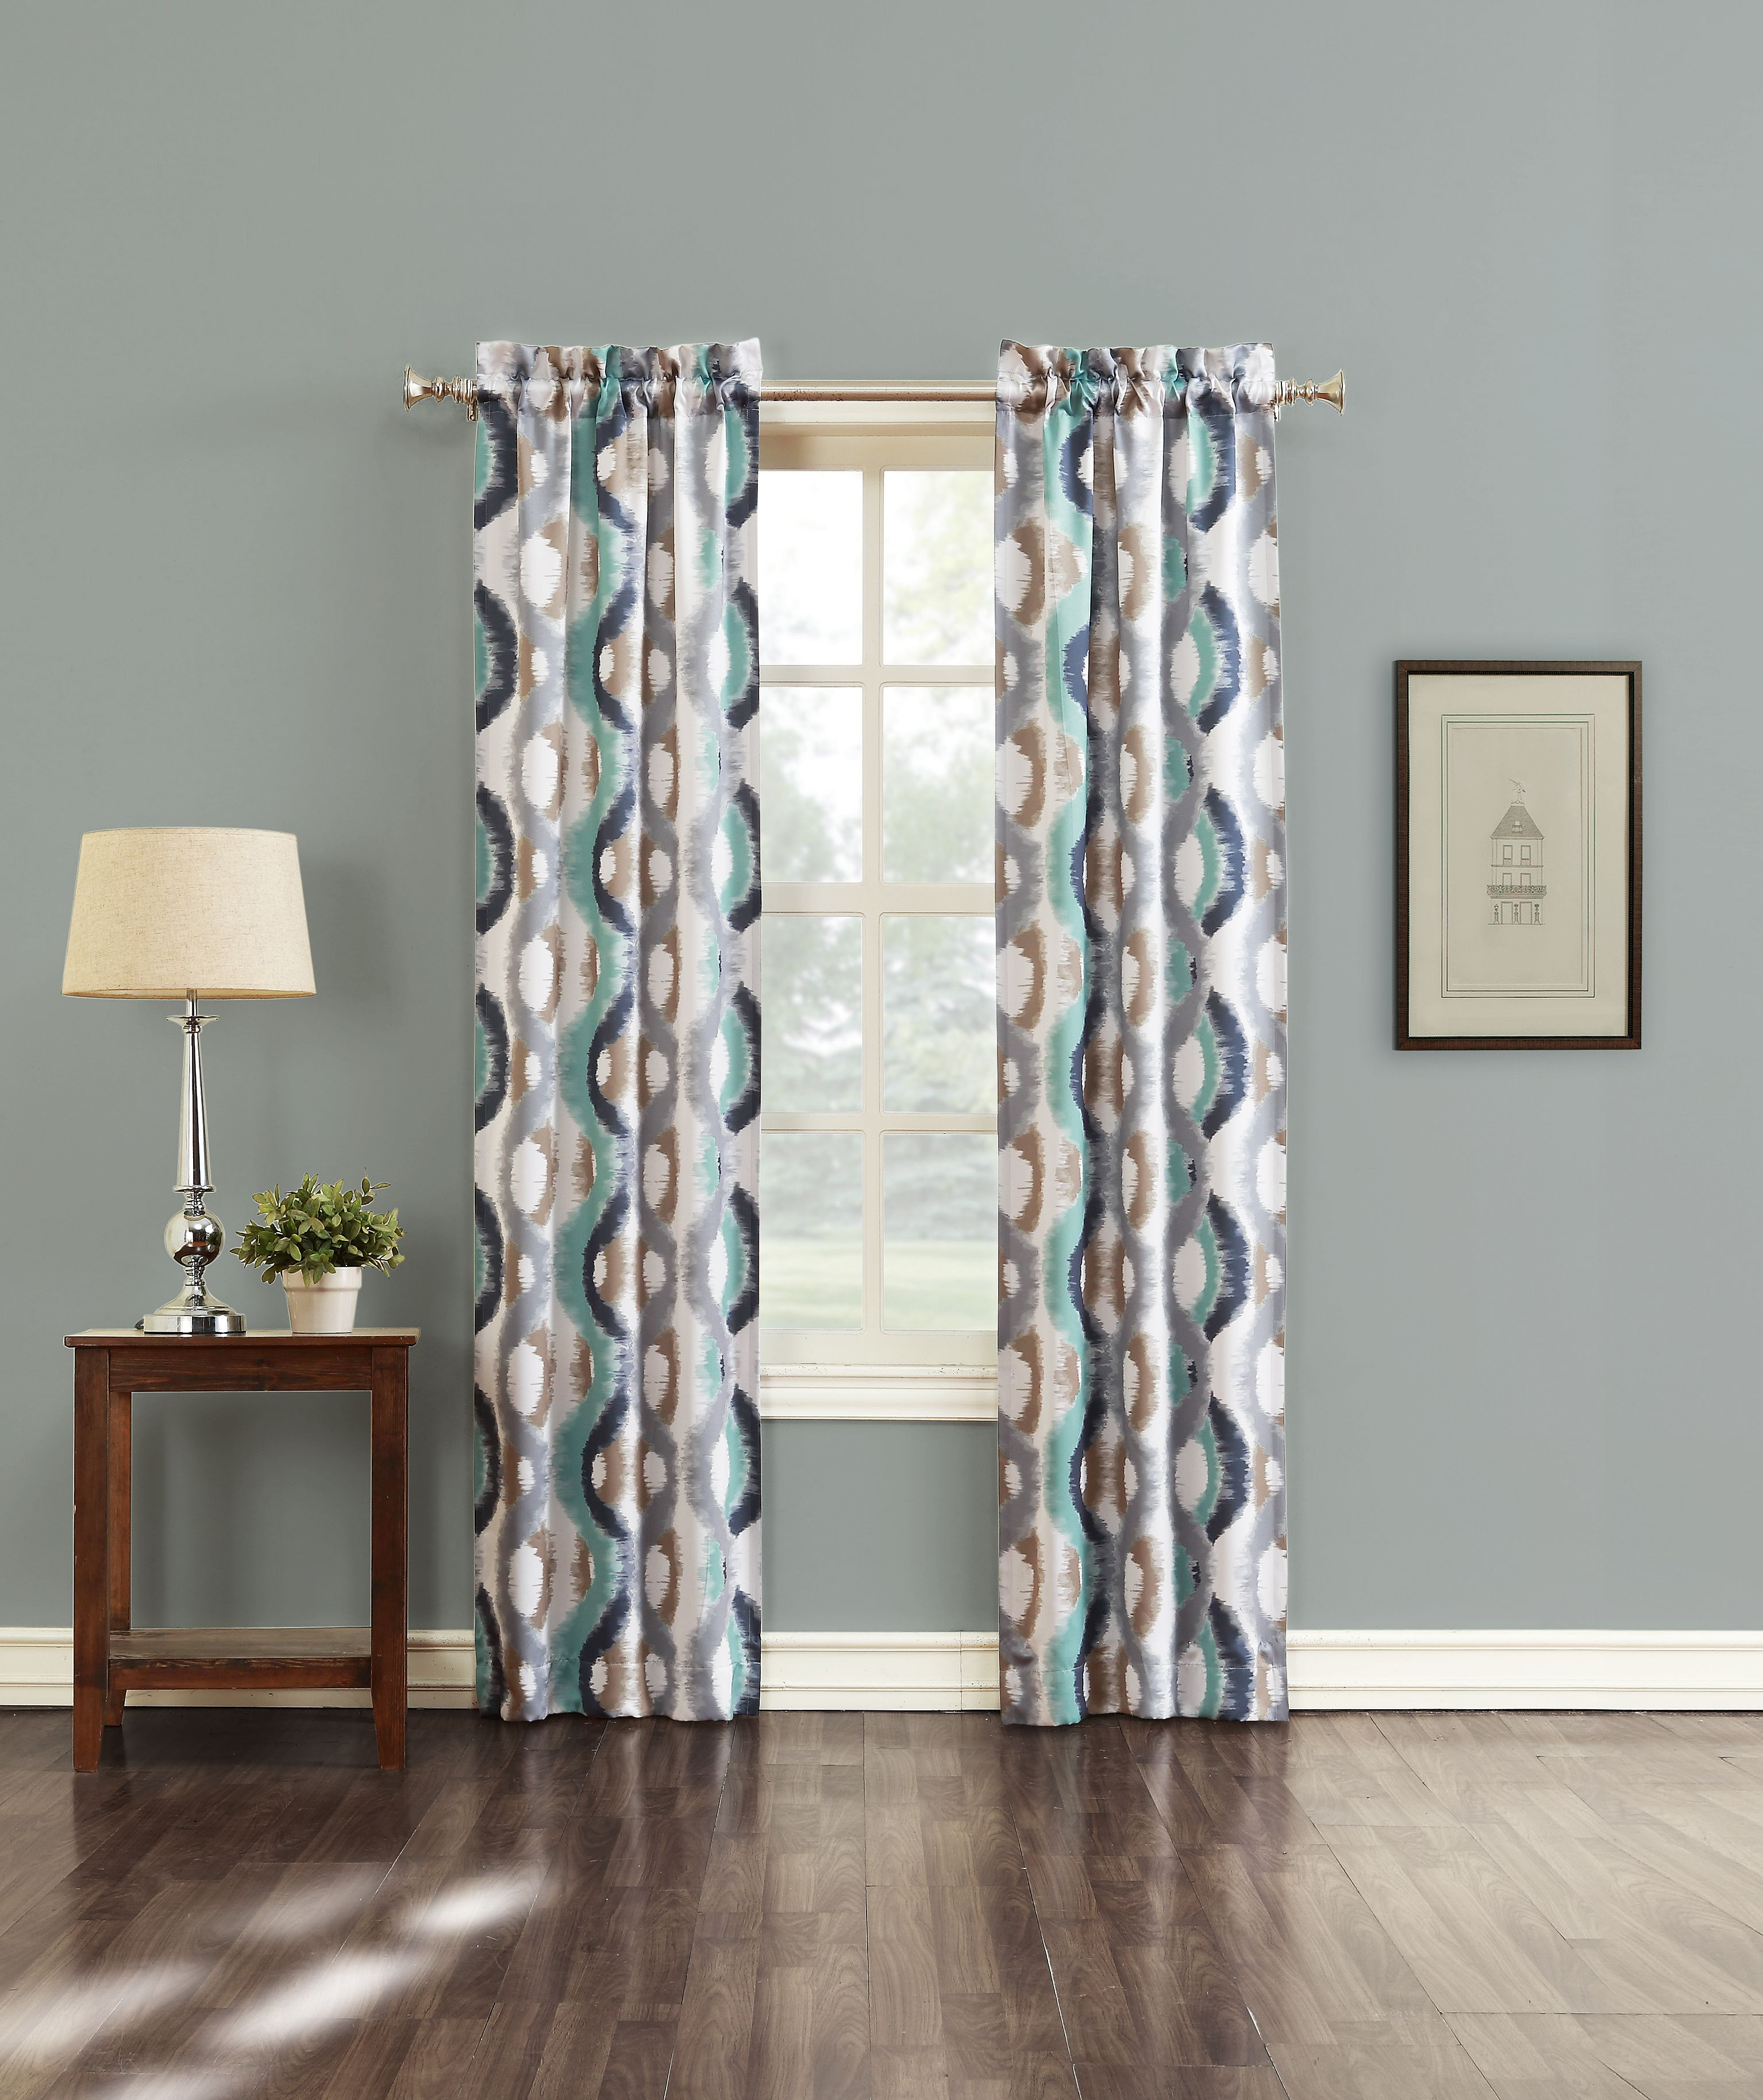 Jaclyn Smith Logan Window Panels Cortez A Geometric Print Room Darkening Panel Grommet Curtains Panel Curtains Curtains #sears #living #room #curtains